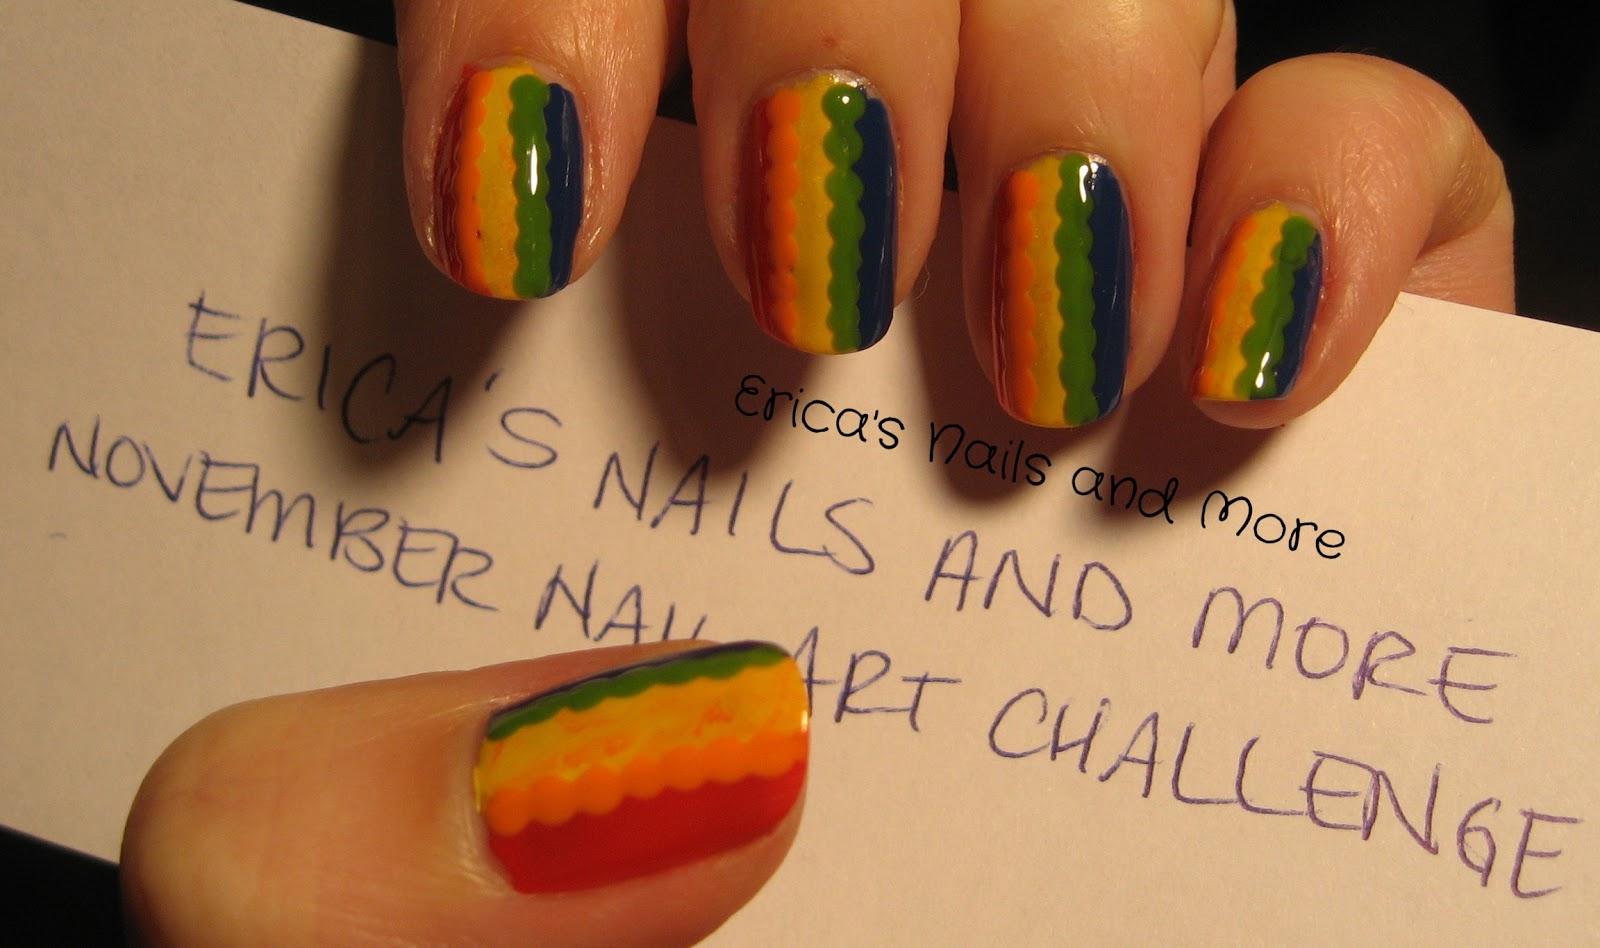 November Nail Art Challenge Erica39s Nails And More Page 2